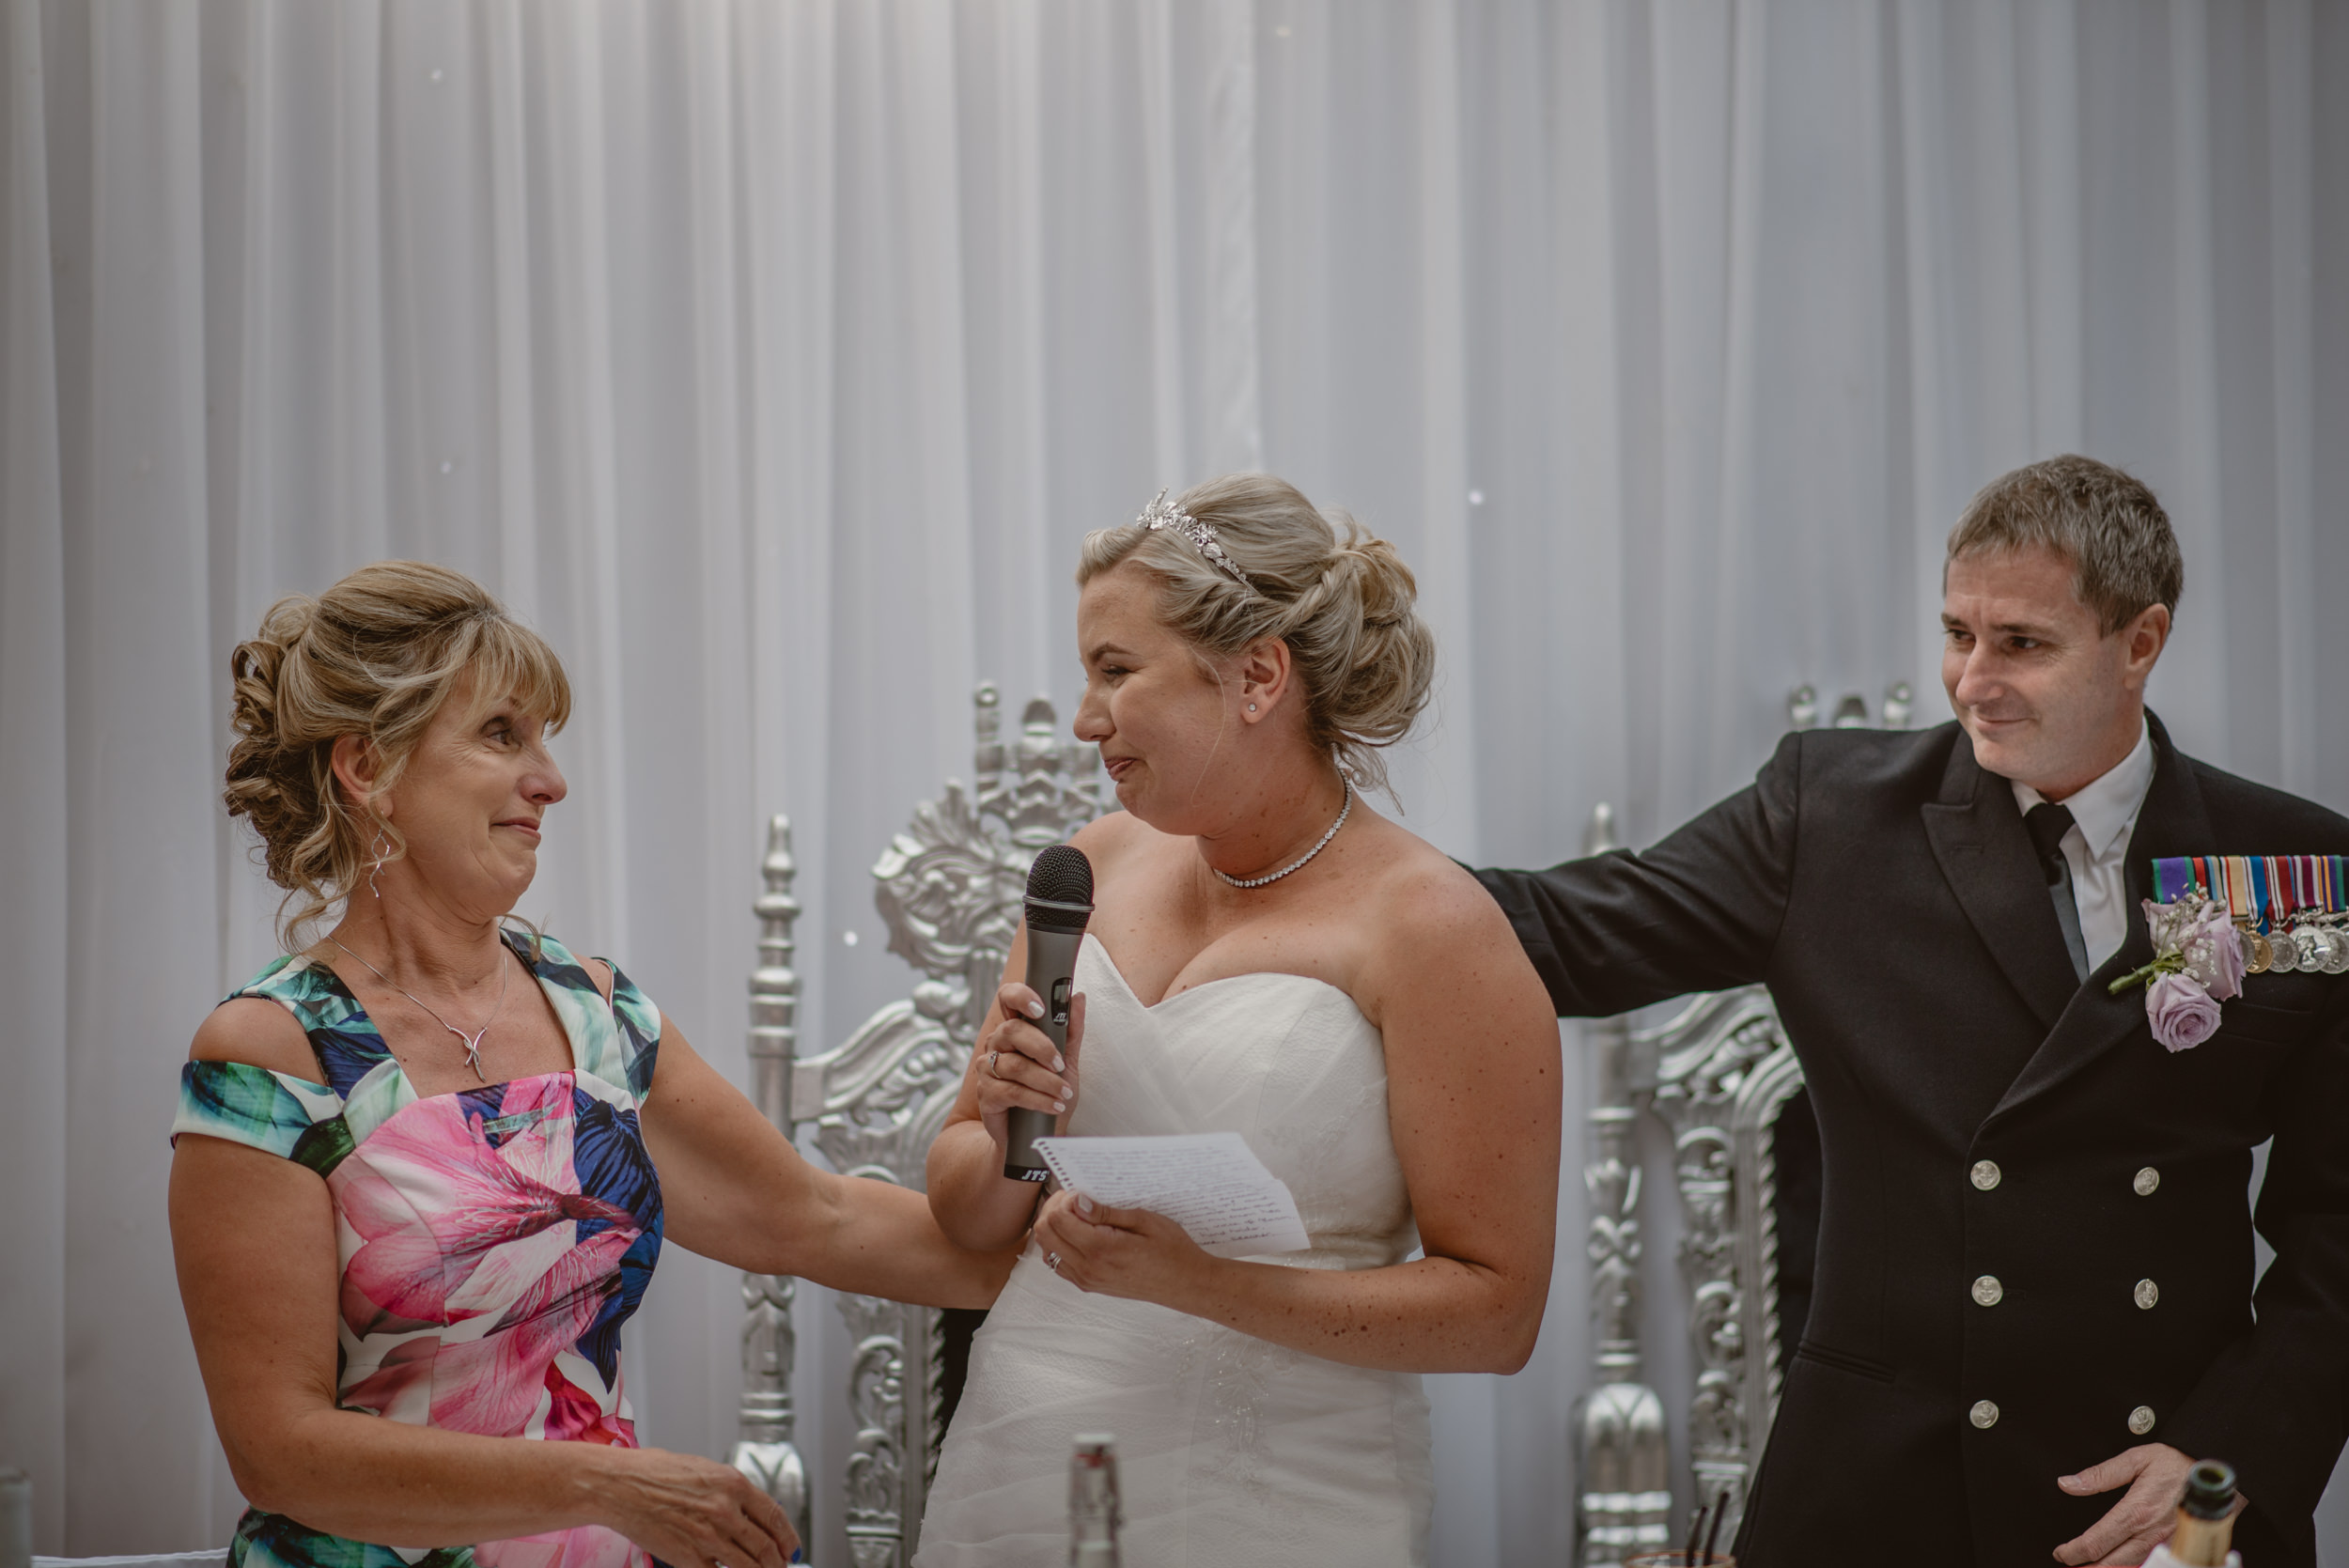 Chantelle-and-Stephen-Old-Thorns-Hotel-Wedding-Liphook-Manu-Mendoza-Wedding-Photography-397.jpg